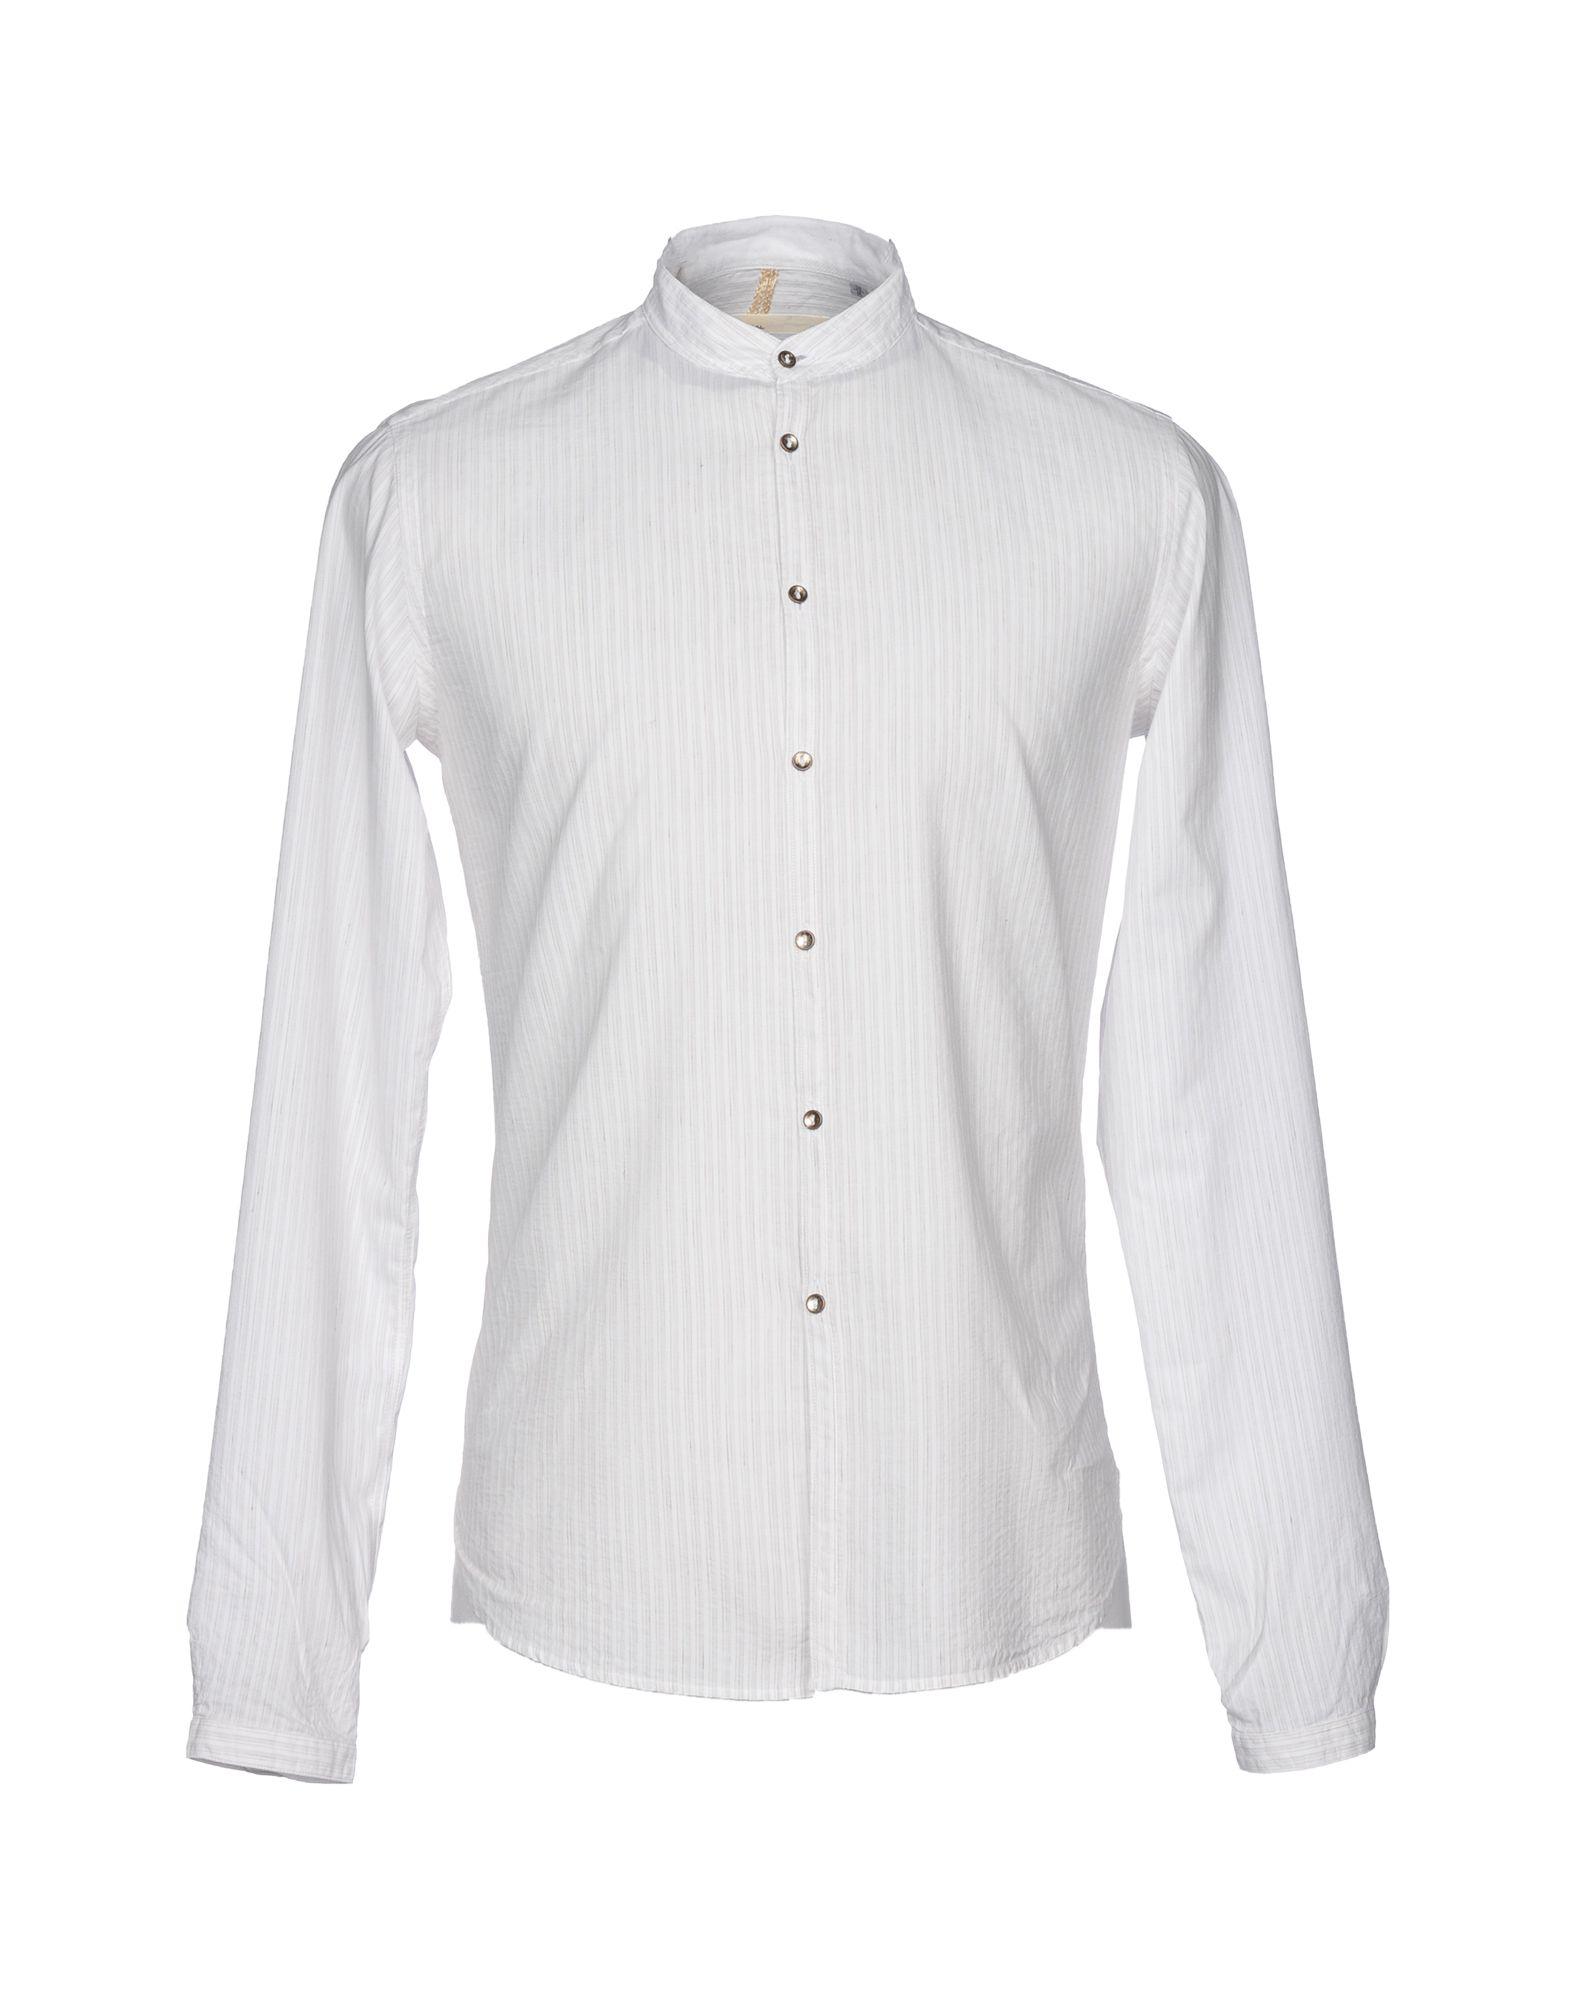 все цены на MICHAEL COAL Pубашка